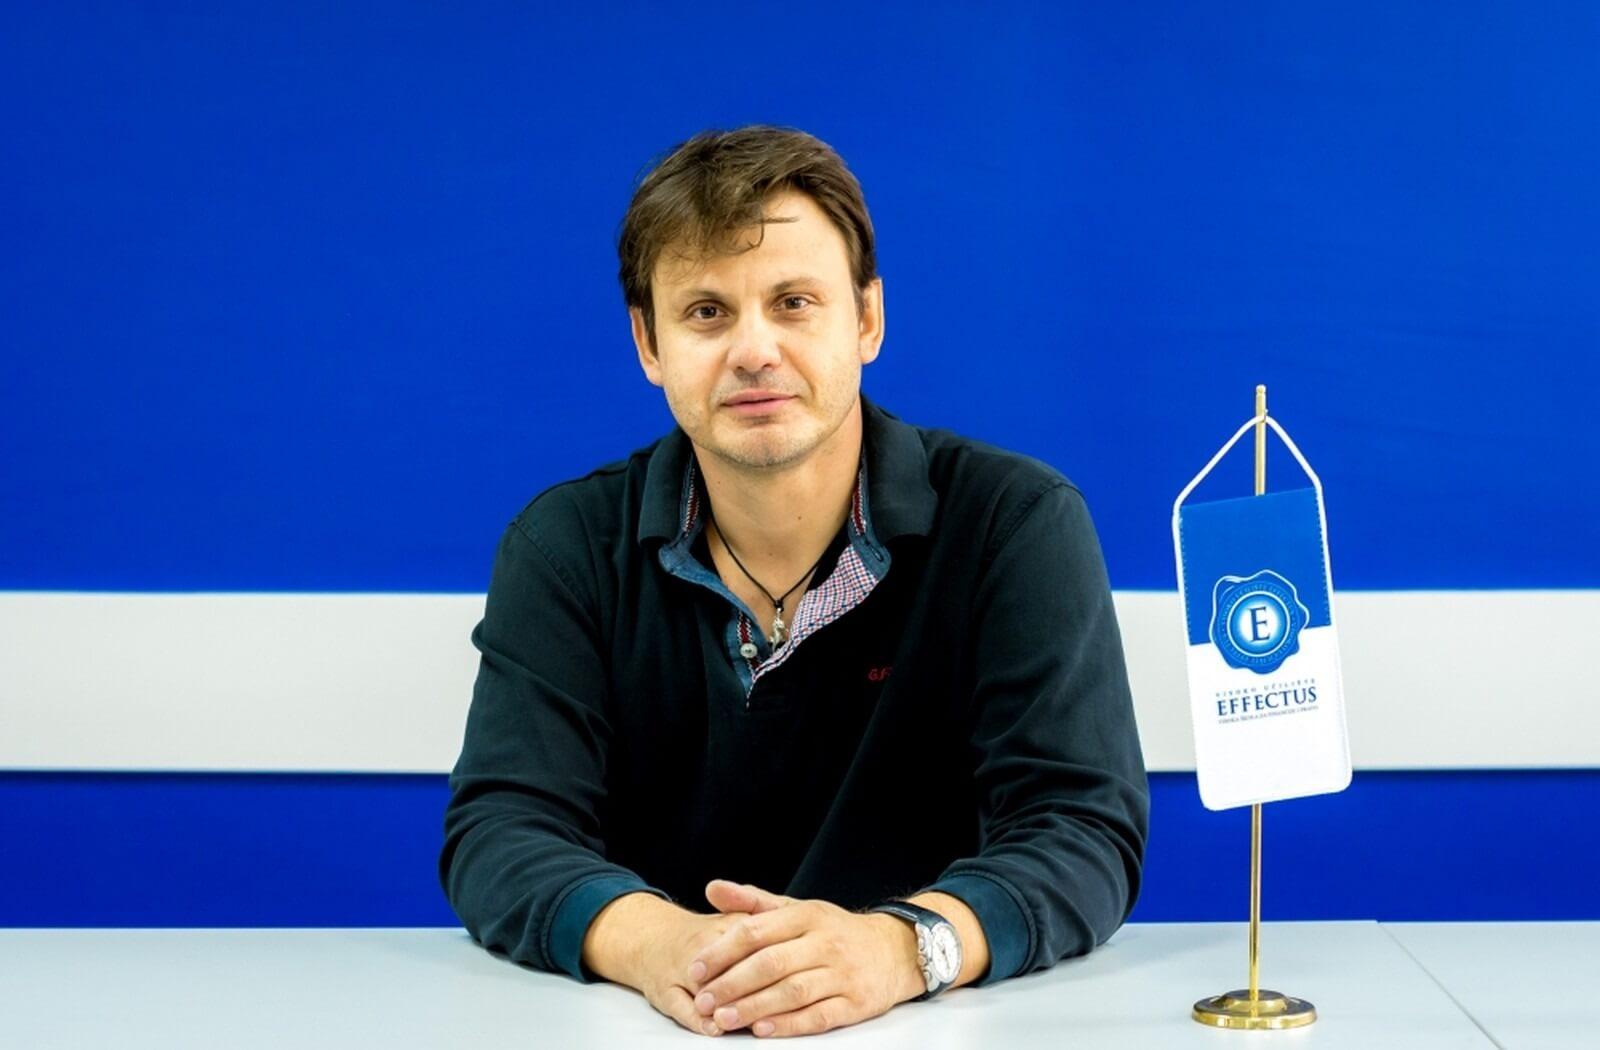 "Profesor Šestanović s Effectusa: ""Da bi ideja bila uspješna, potrebno je preuzimati rizike te konstantno ustrajati"""